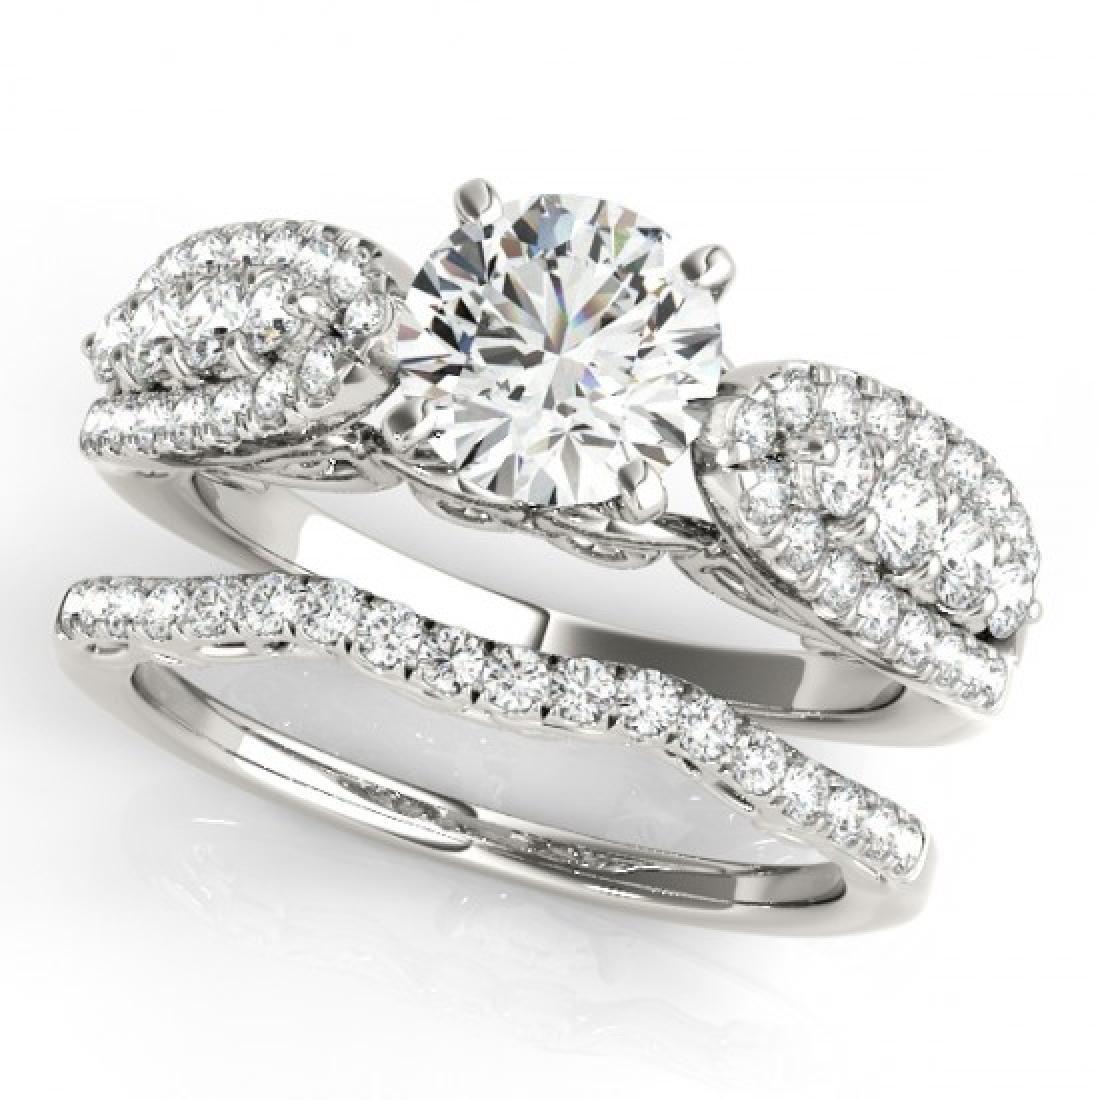 1.71 CTW Certified VS/SI Diamond Solitaire 2Pc Wedding